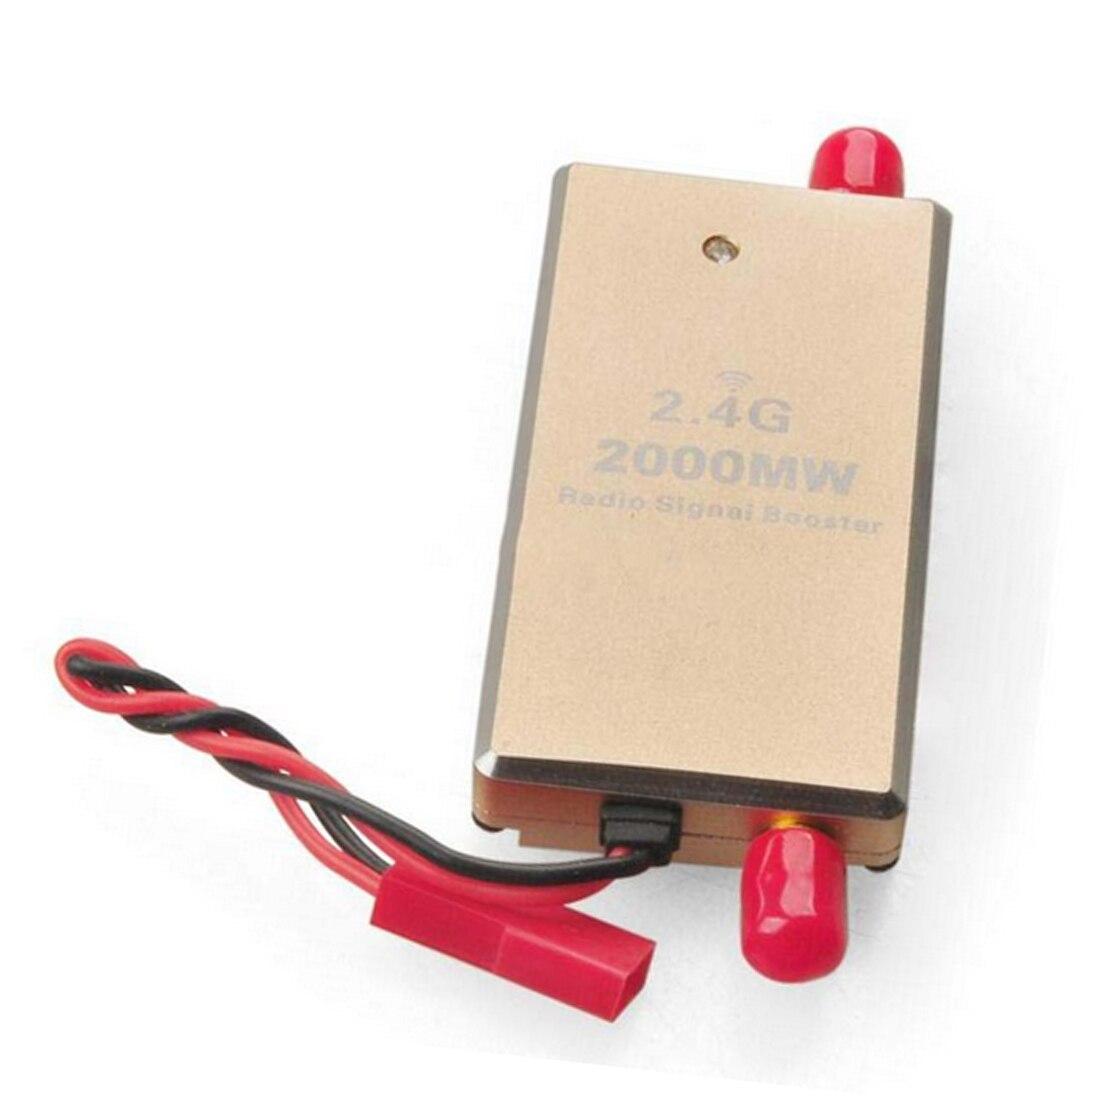 FPV 2.4G 2W 2000mW Mini Radio Signal Booster Amplifier Module for Phantom RC Transmitter FPV Extend Range цена и фото